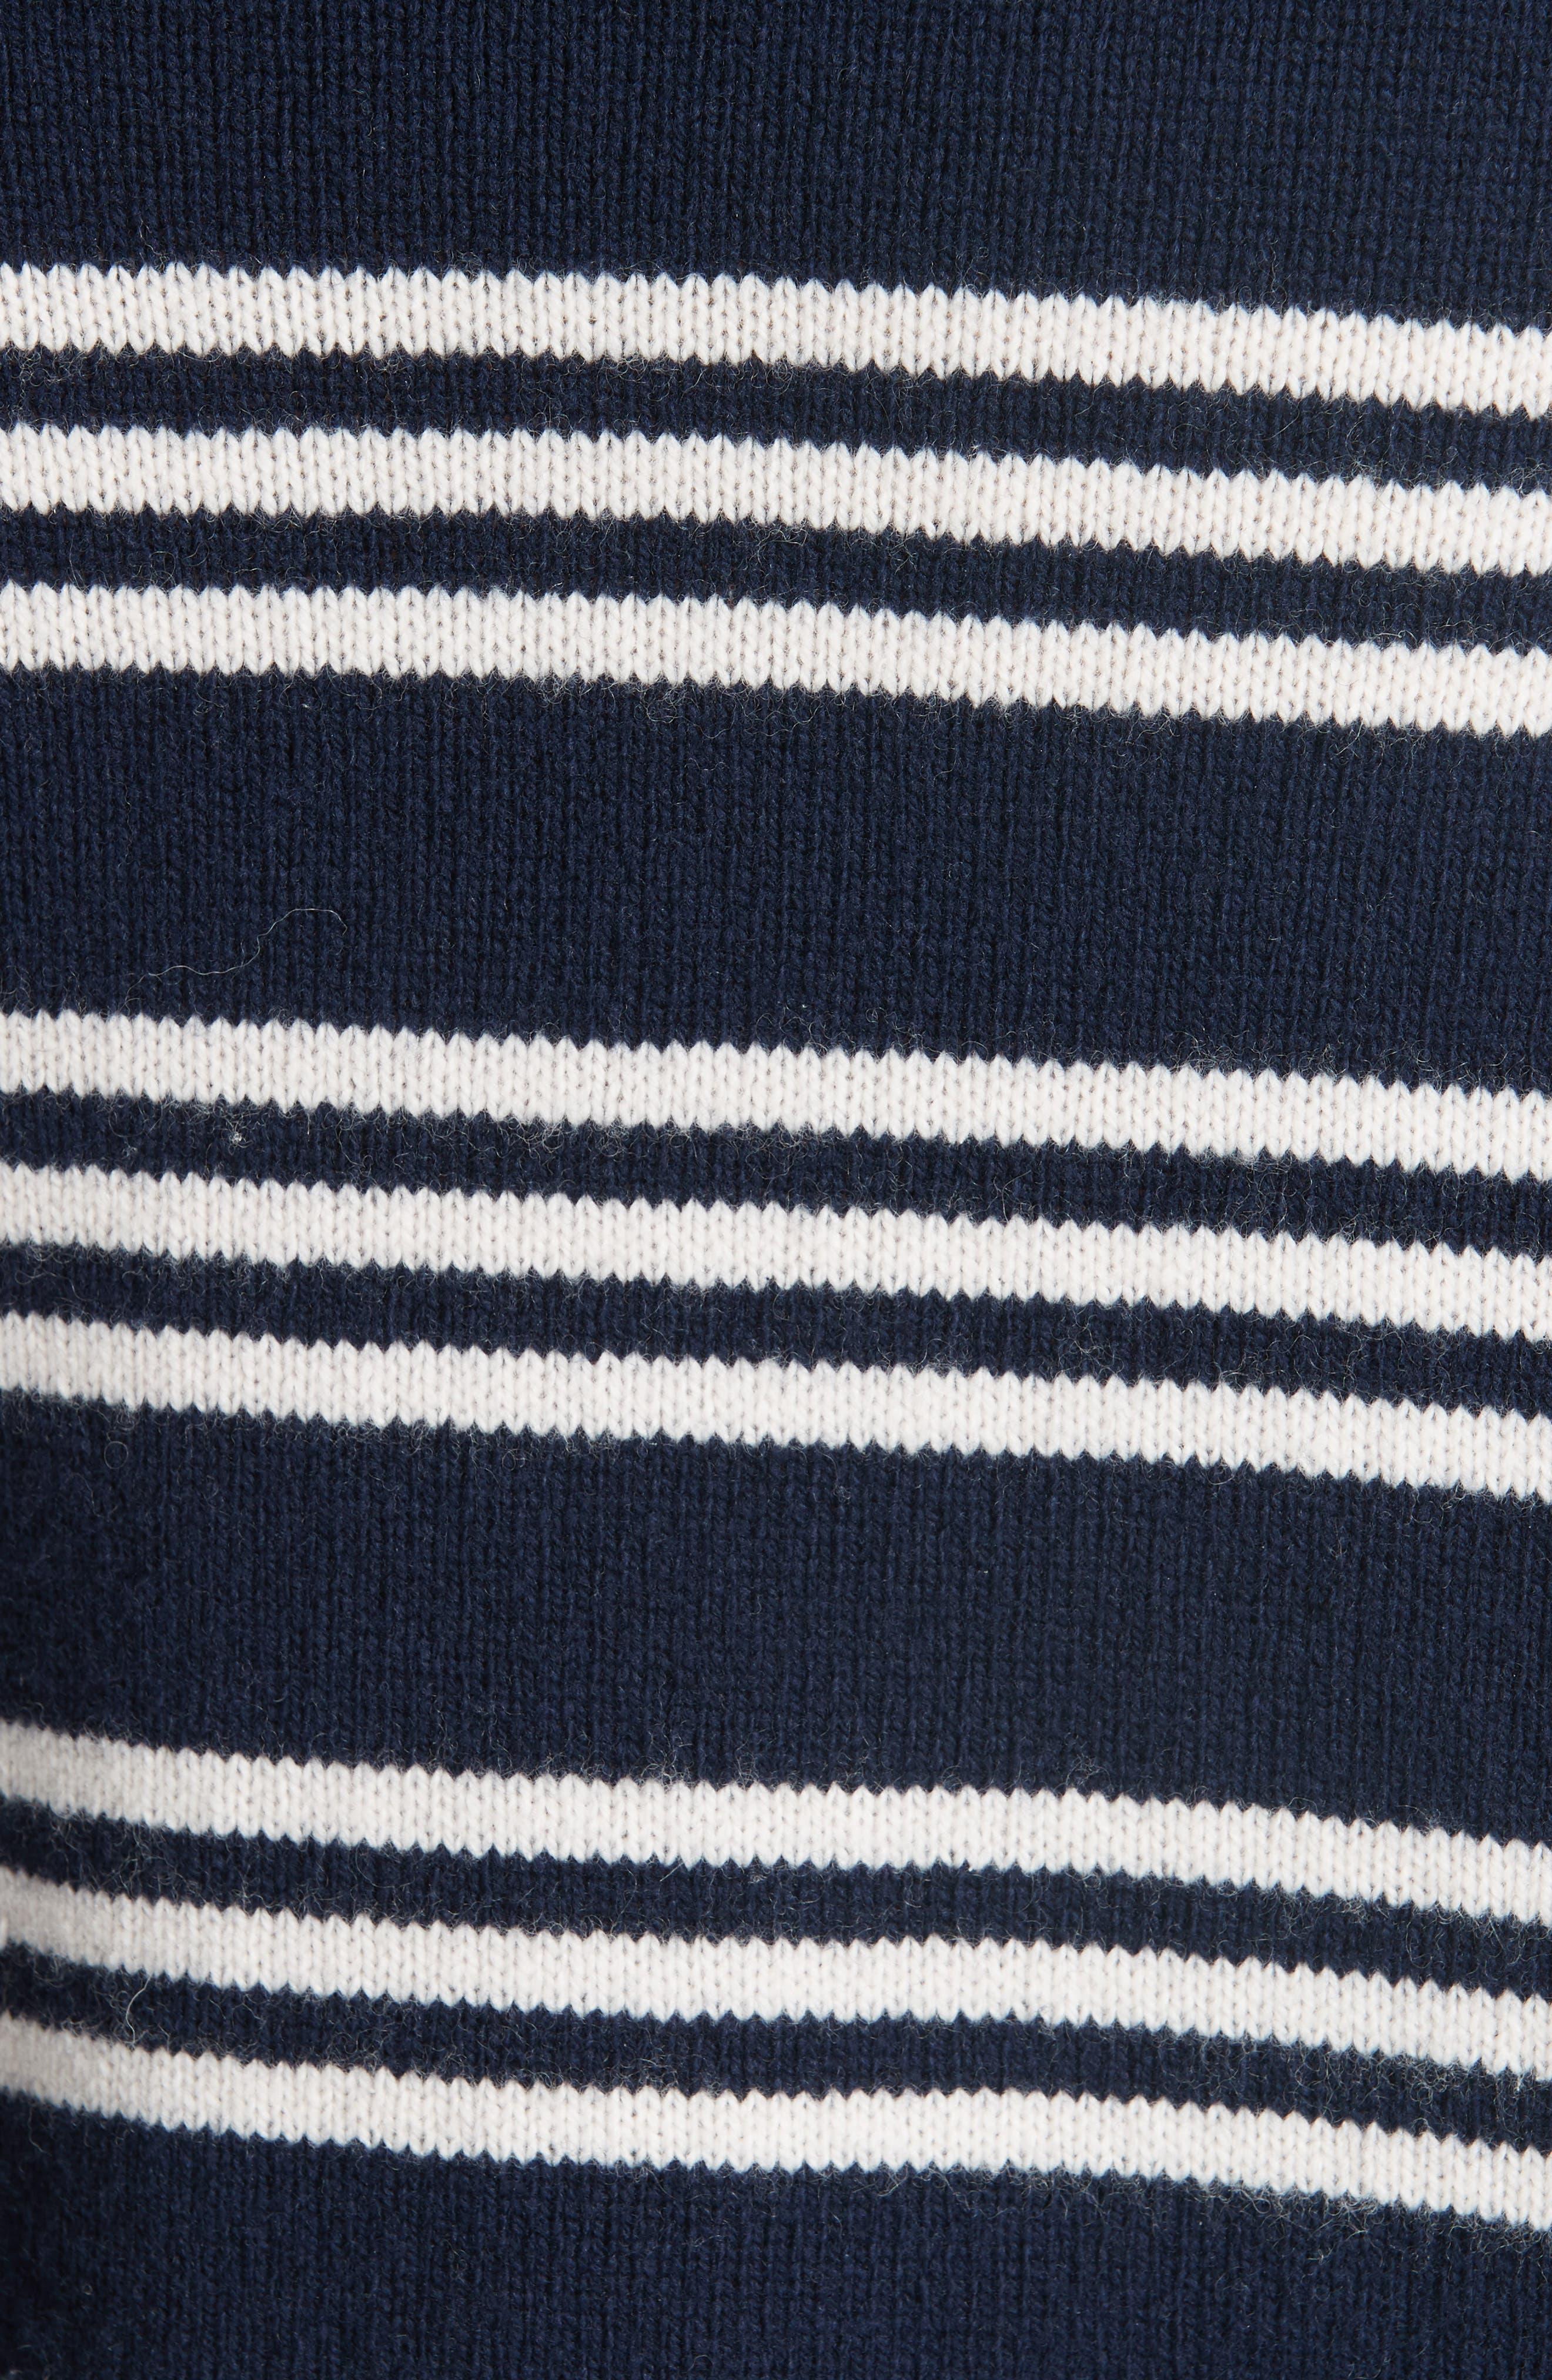 Striped Wool Cotton Blend Blouson Sleeve Sweater,                             Alternate thumbnail 5, color,                             482